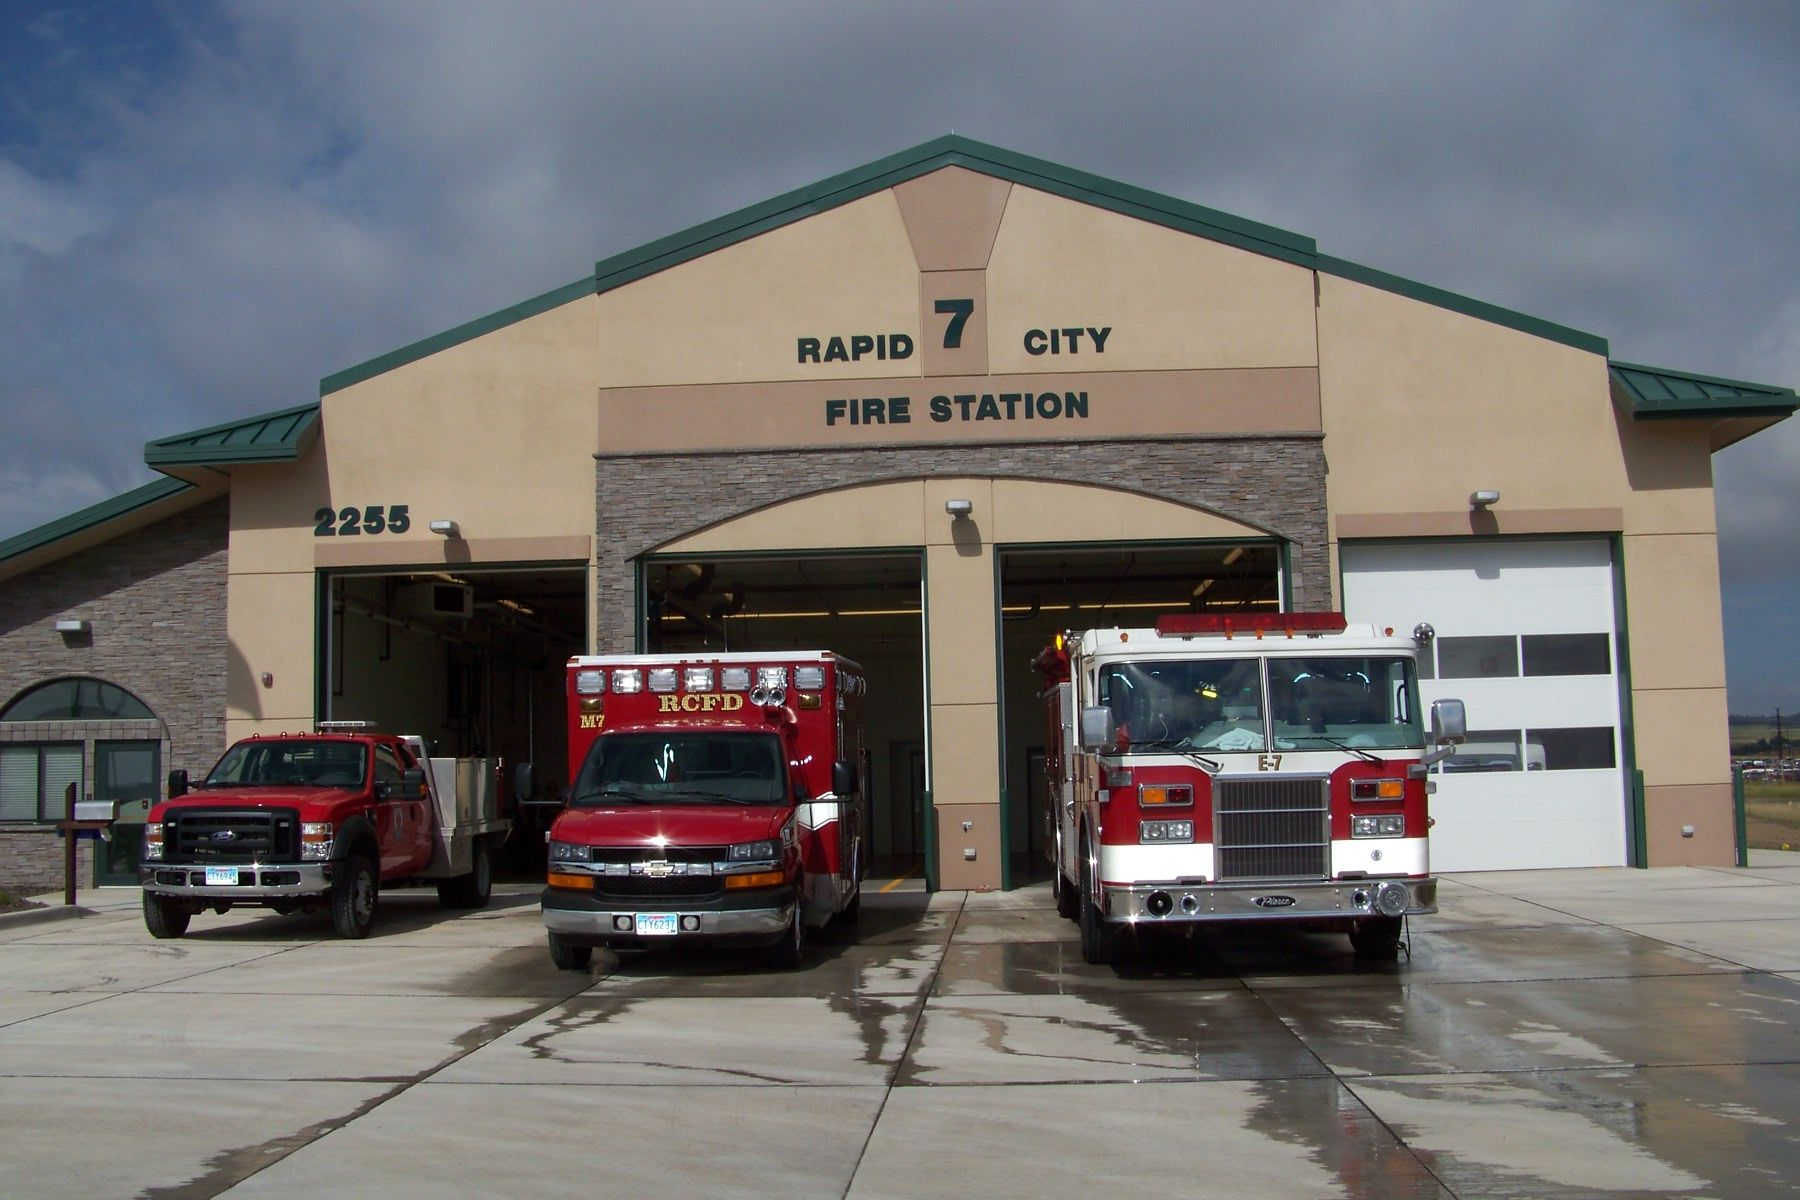 17 Best images about Fire station 7 on Pinterest | Lone survivor ...